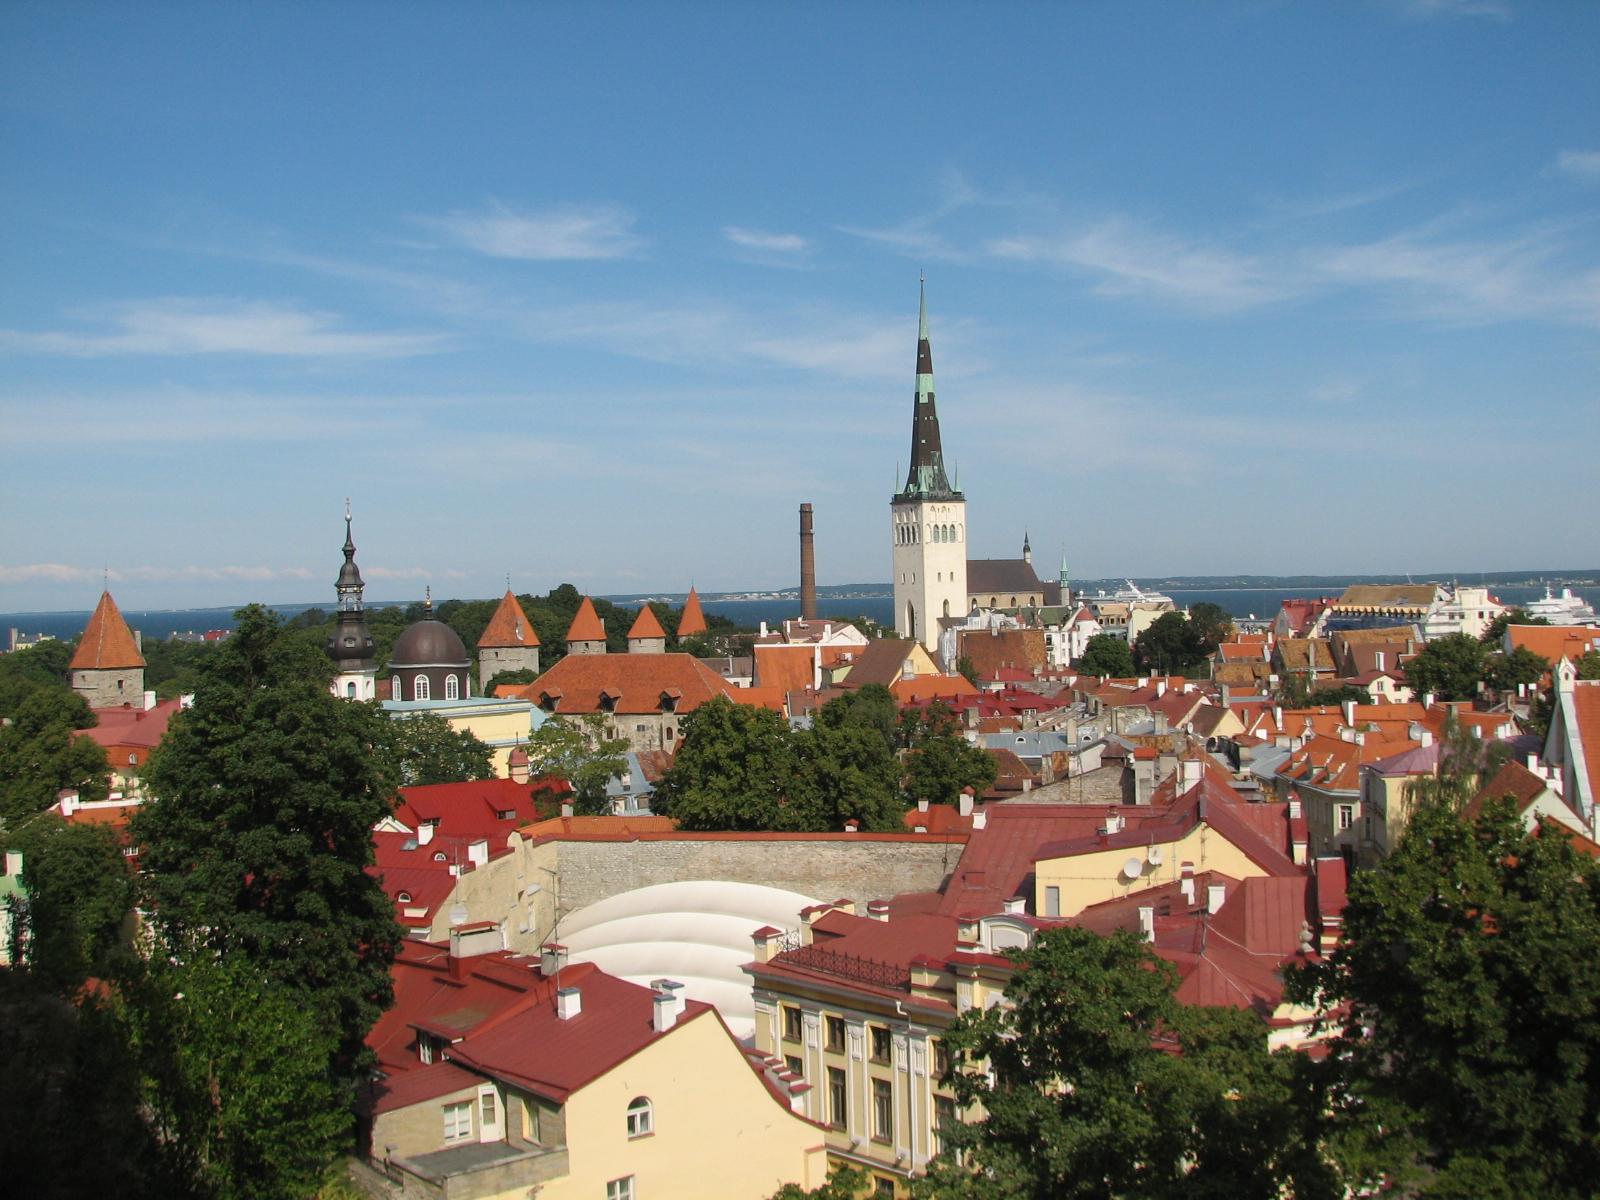 Эстония 2012. Пярну. Сааремаа. Таллинн.